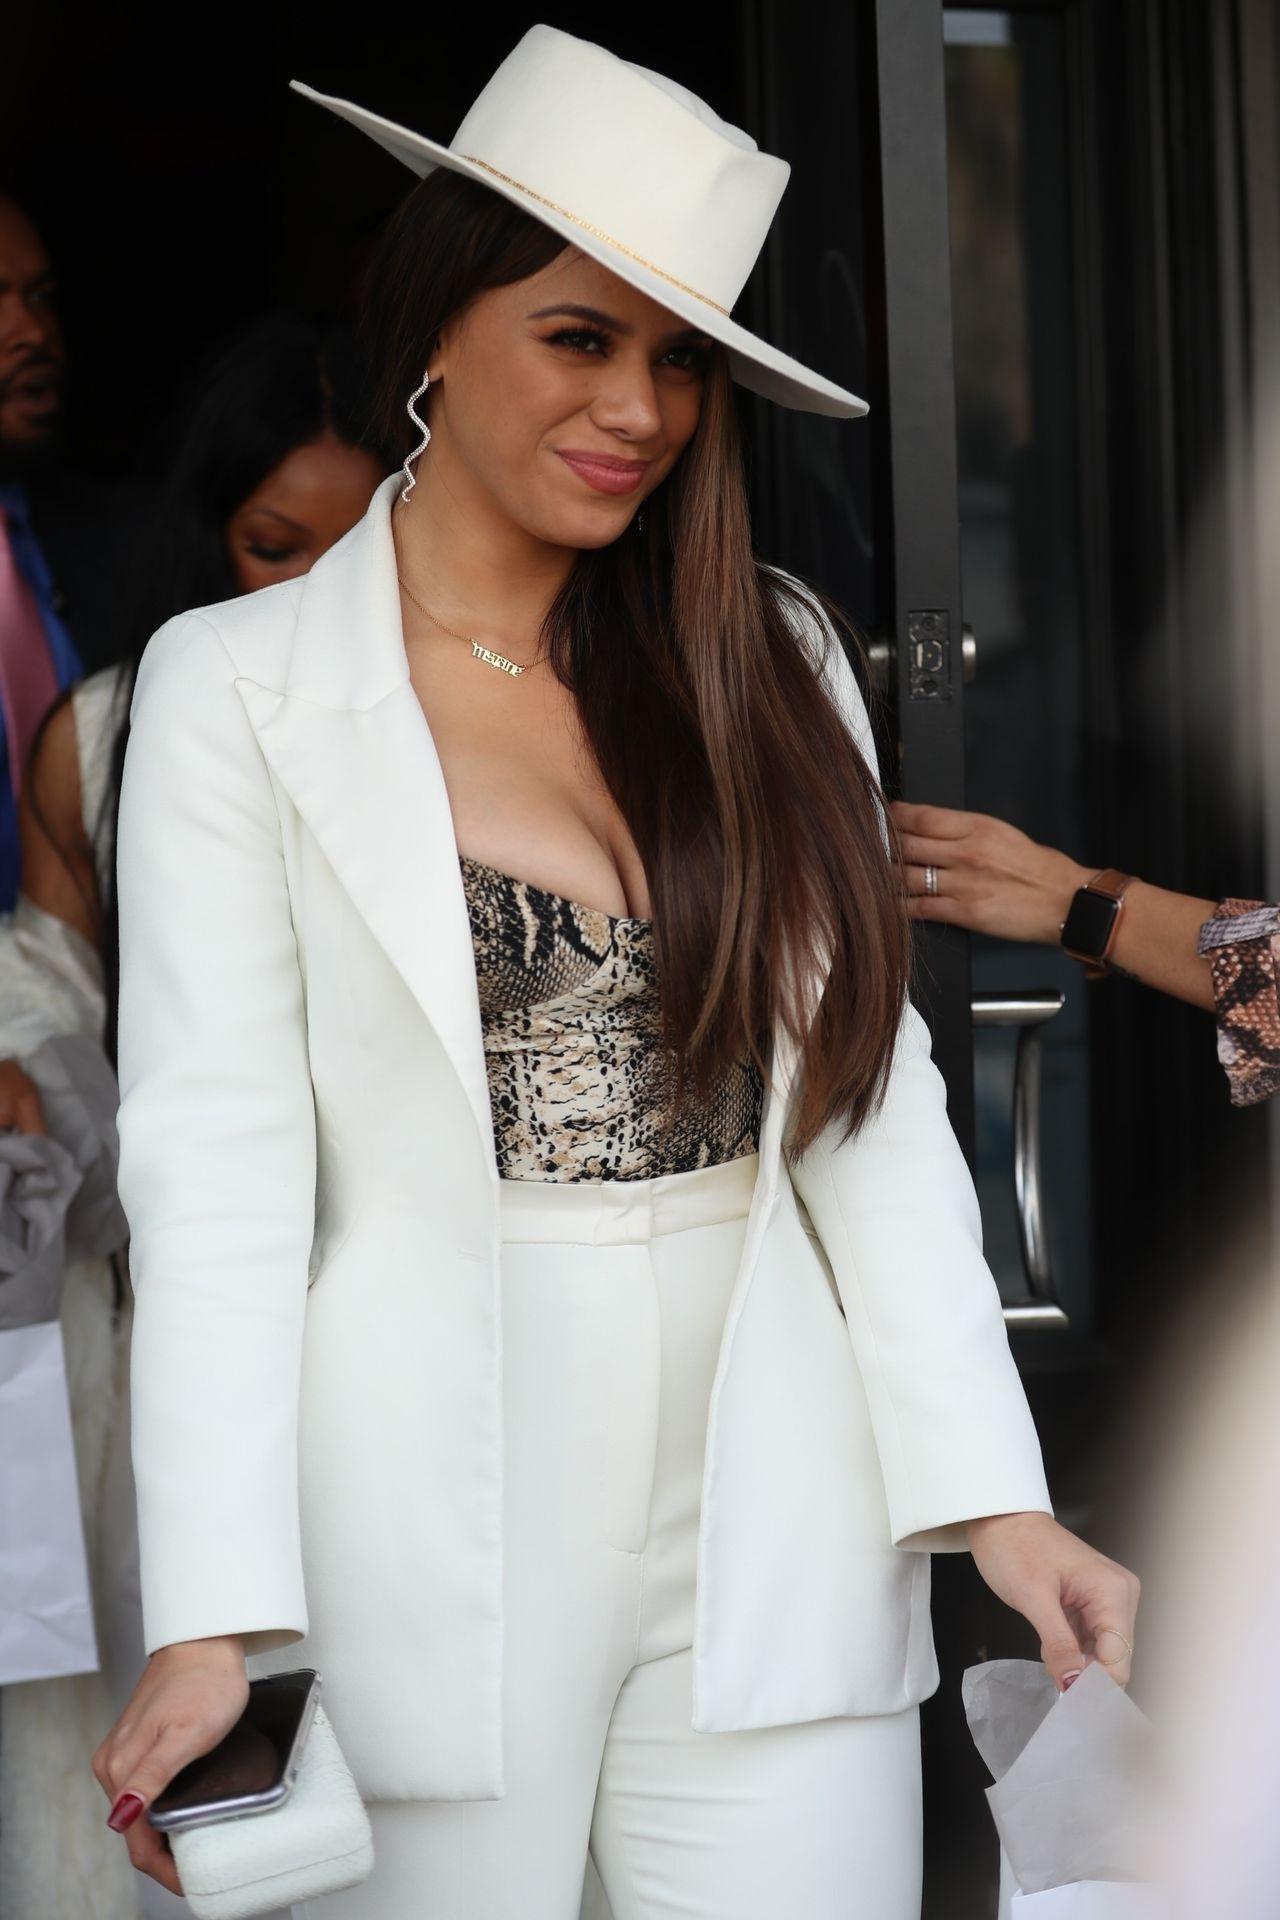 Dinah Jane Departs The Women In Harmony Pre Grammy Luncheon 0029